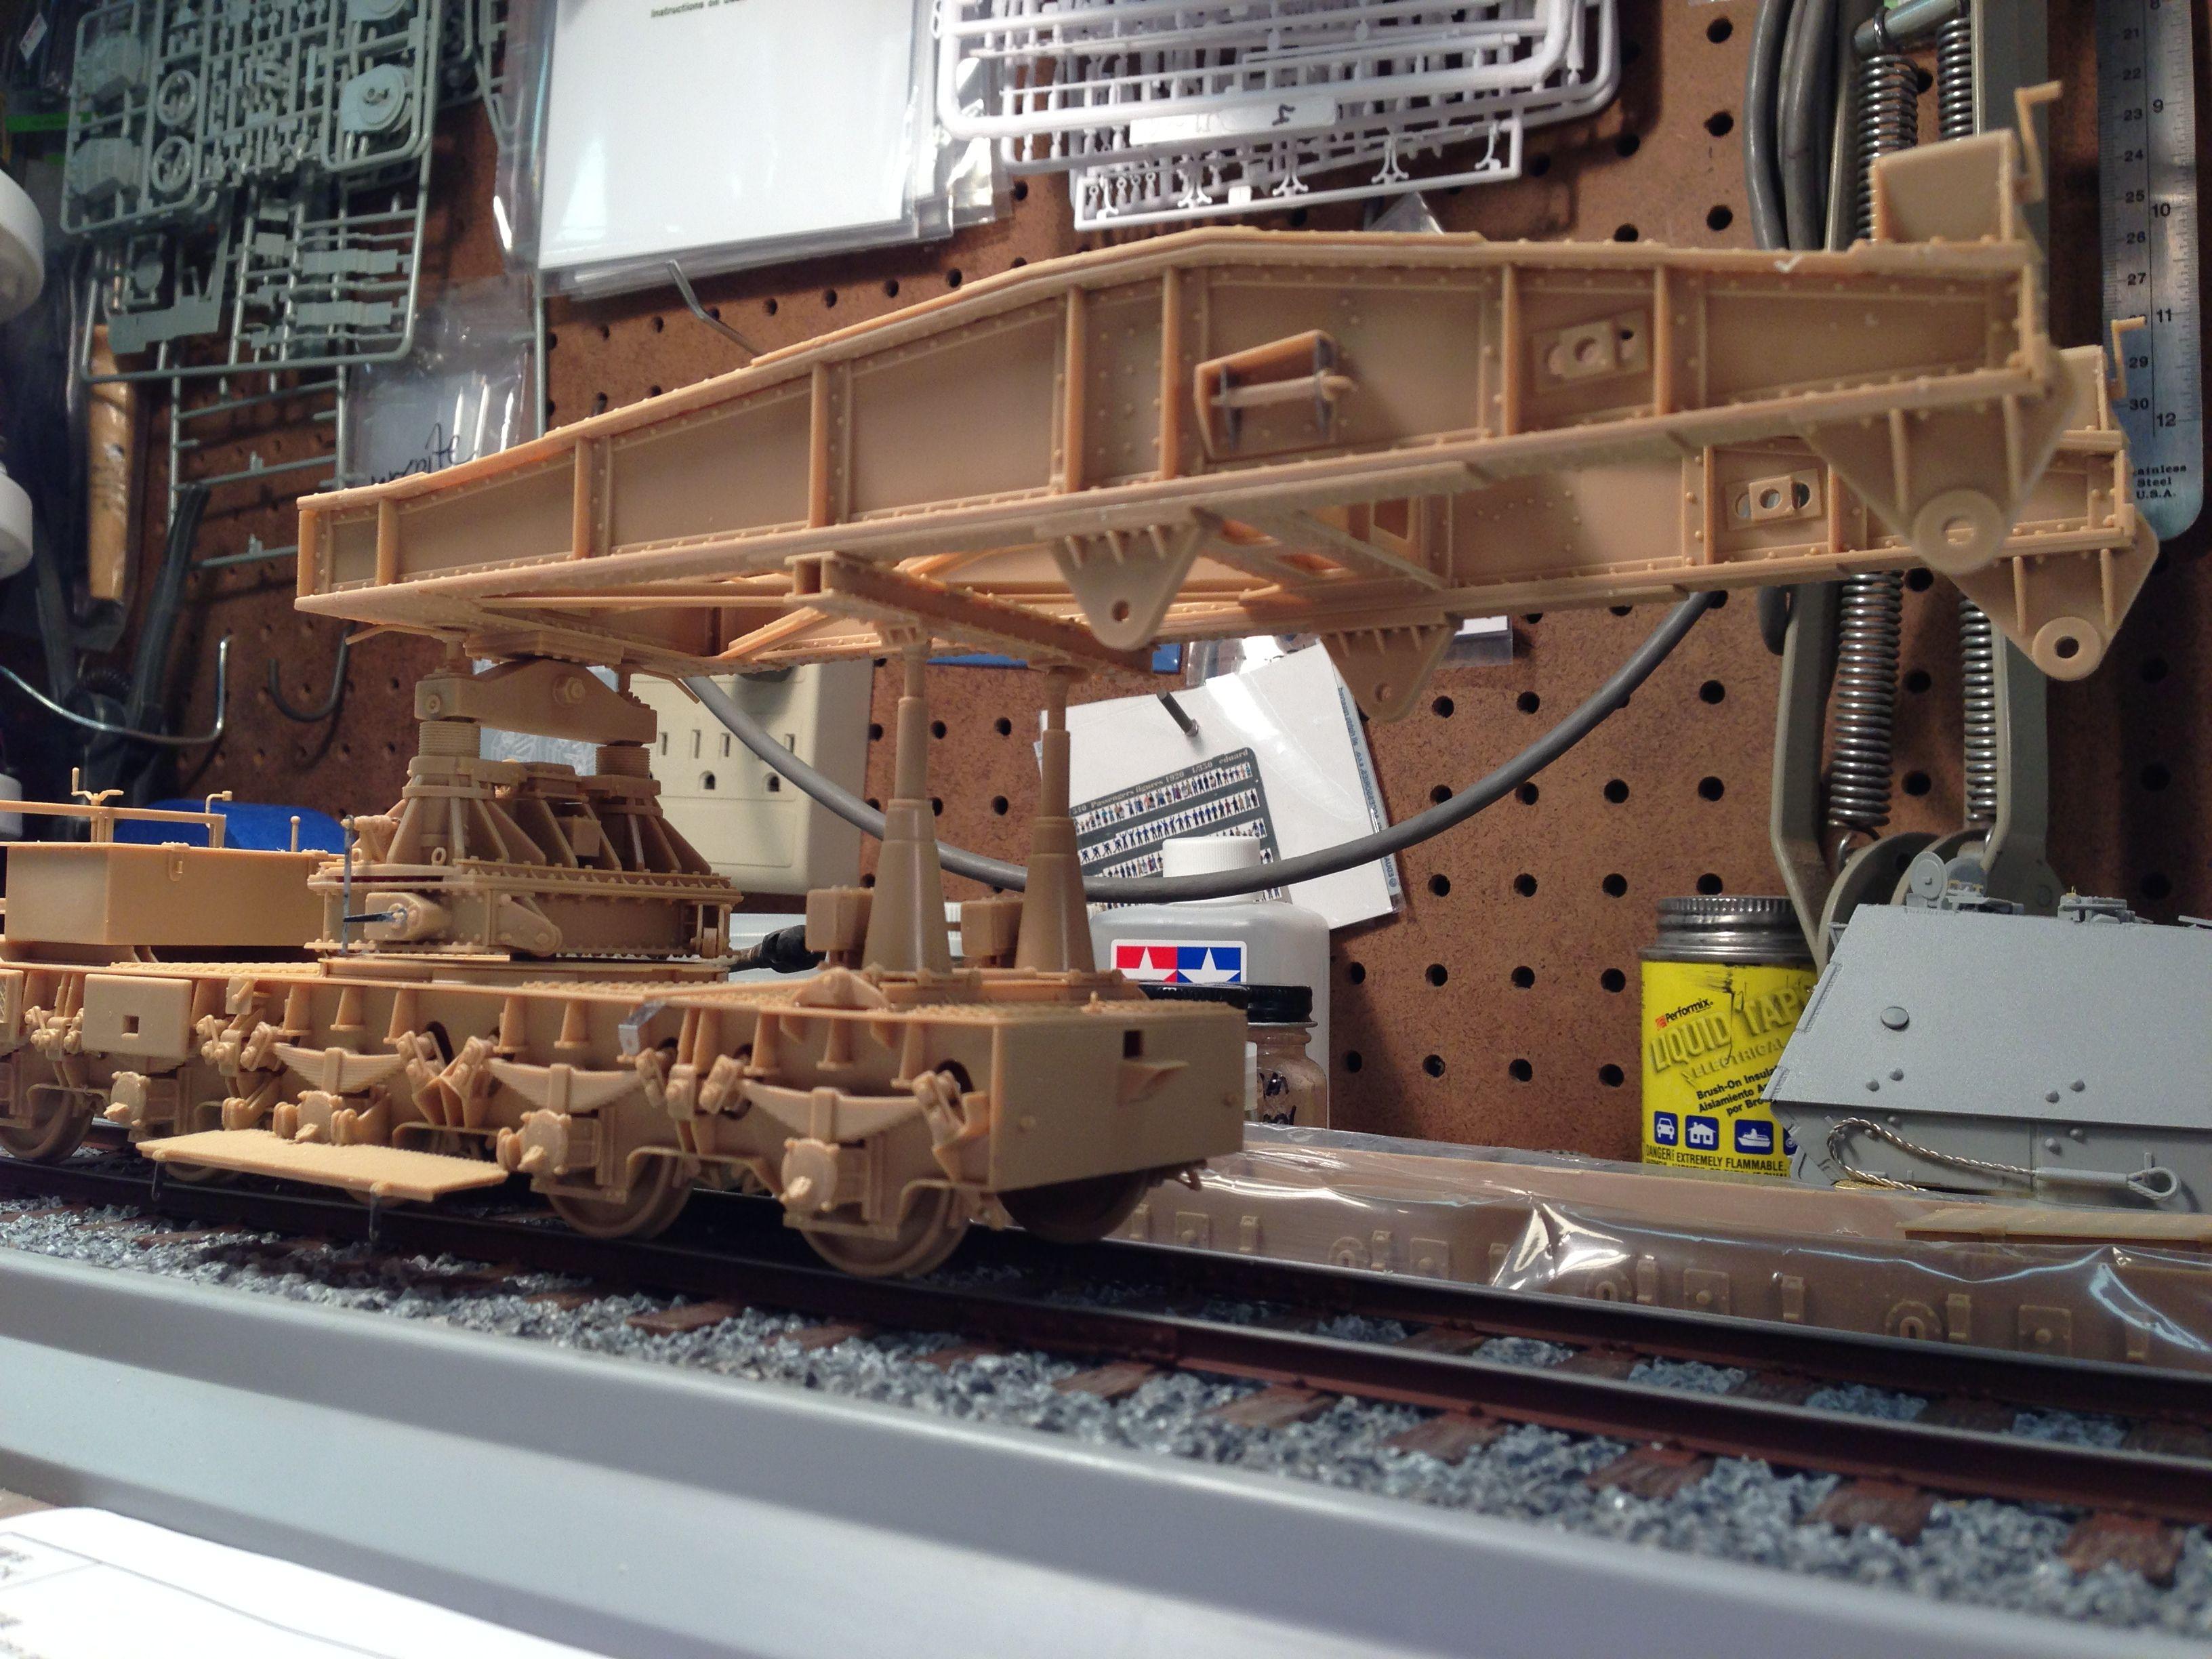 Dora rail gun model by Mike Ragonese in progress